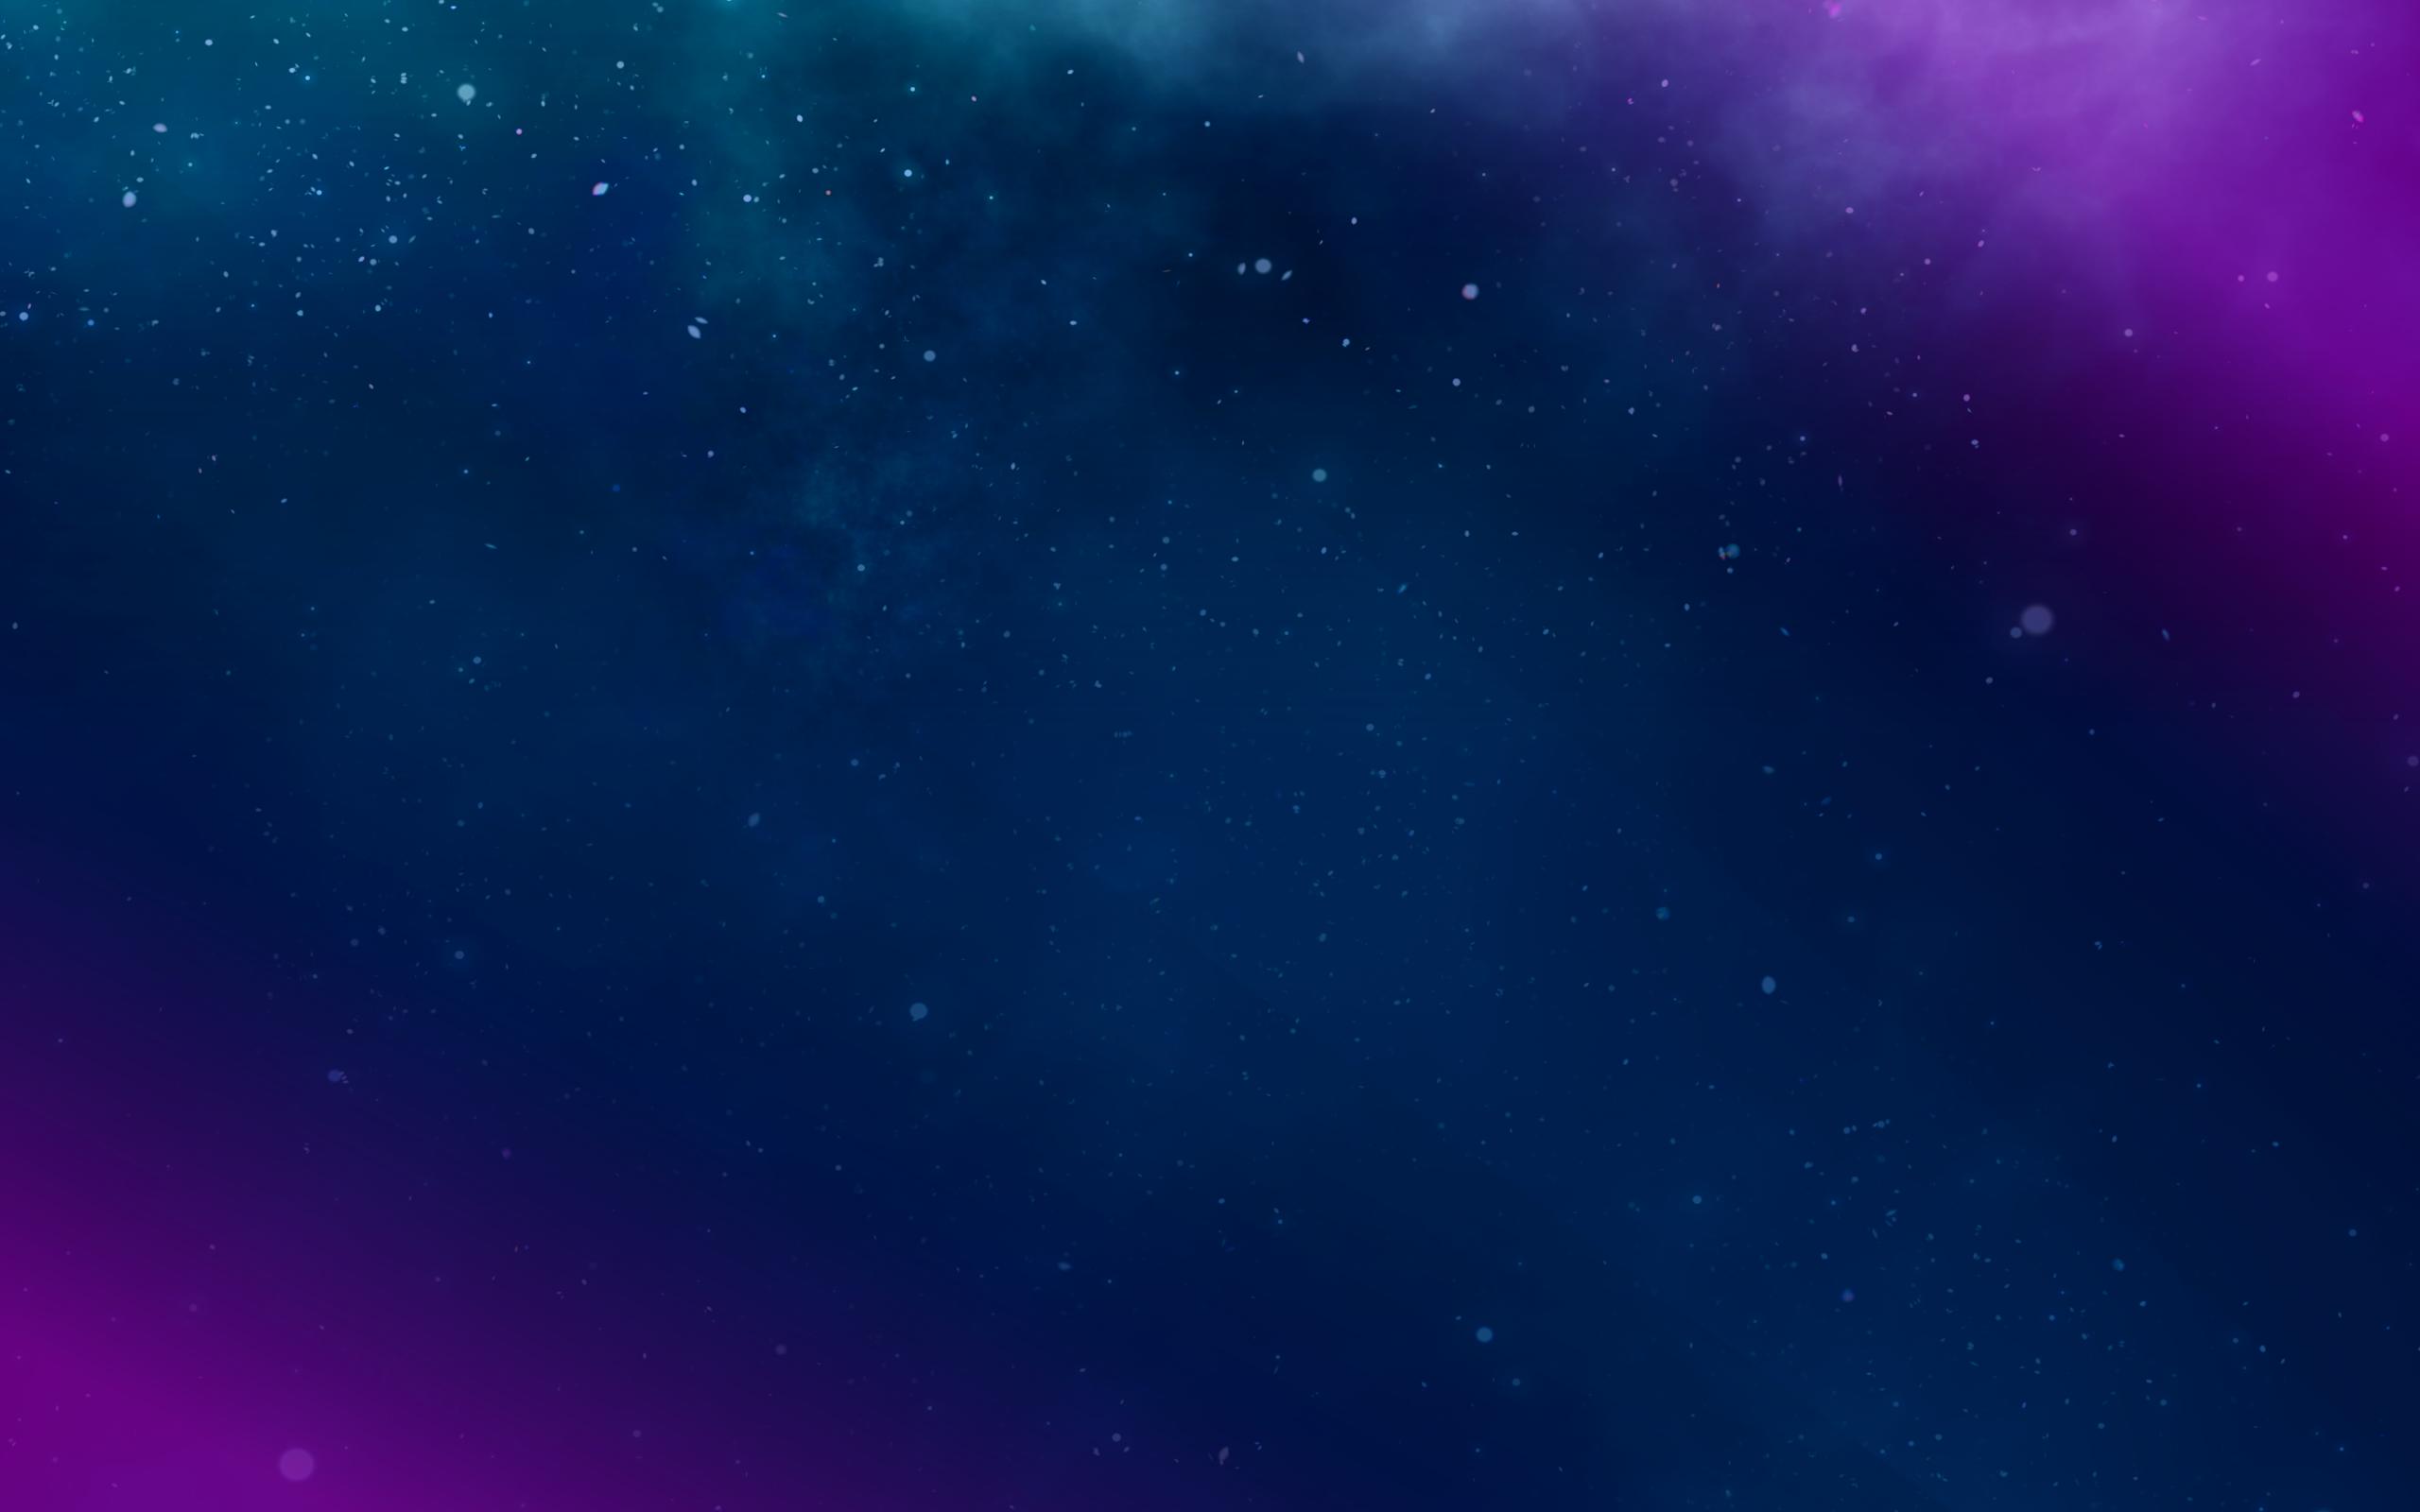 Lubuntu 18.10 Cosmic Cuttlefish Default Desktop Wallpapers.